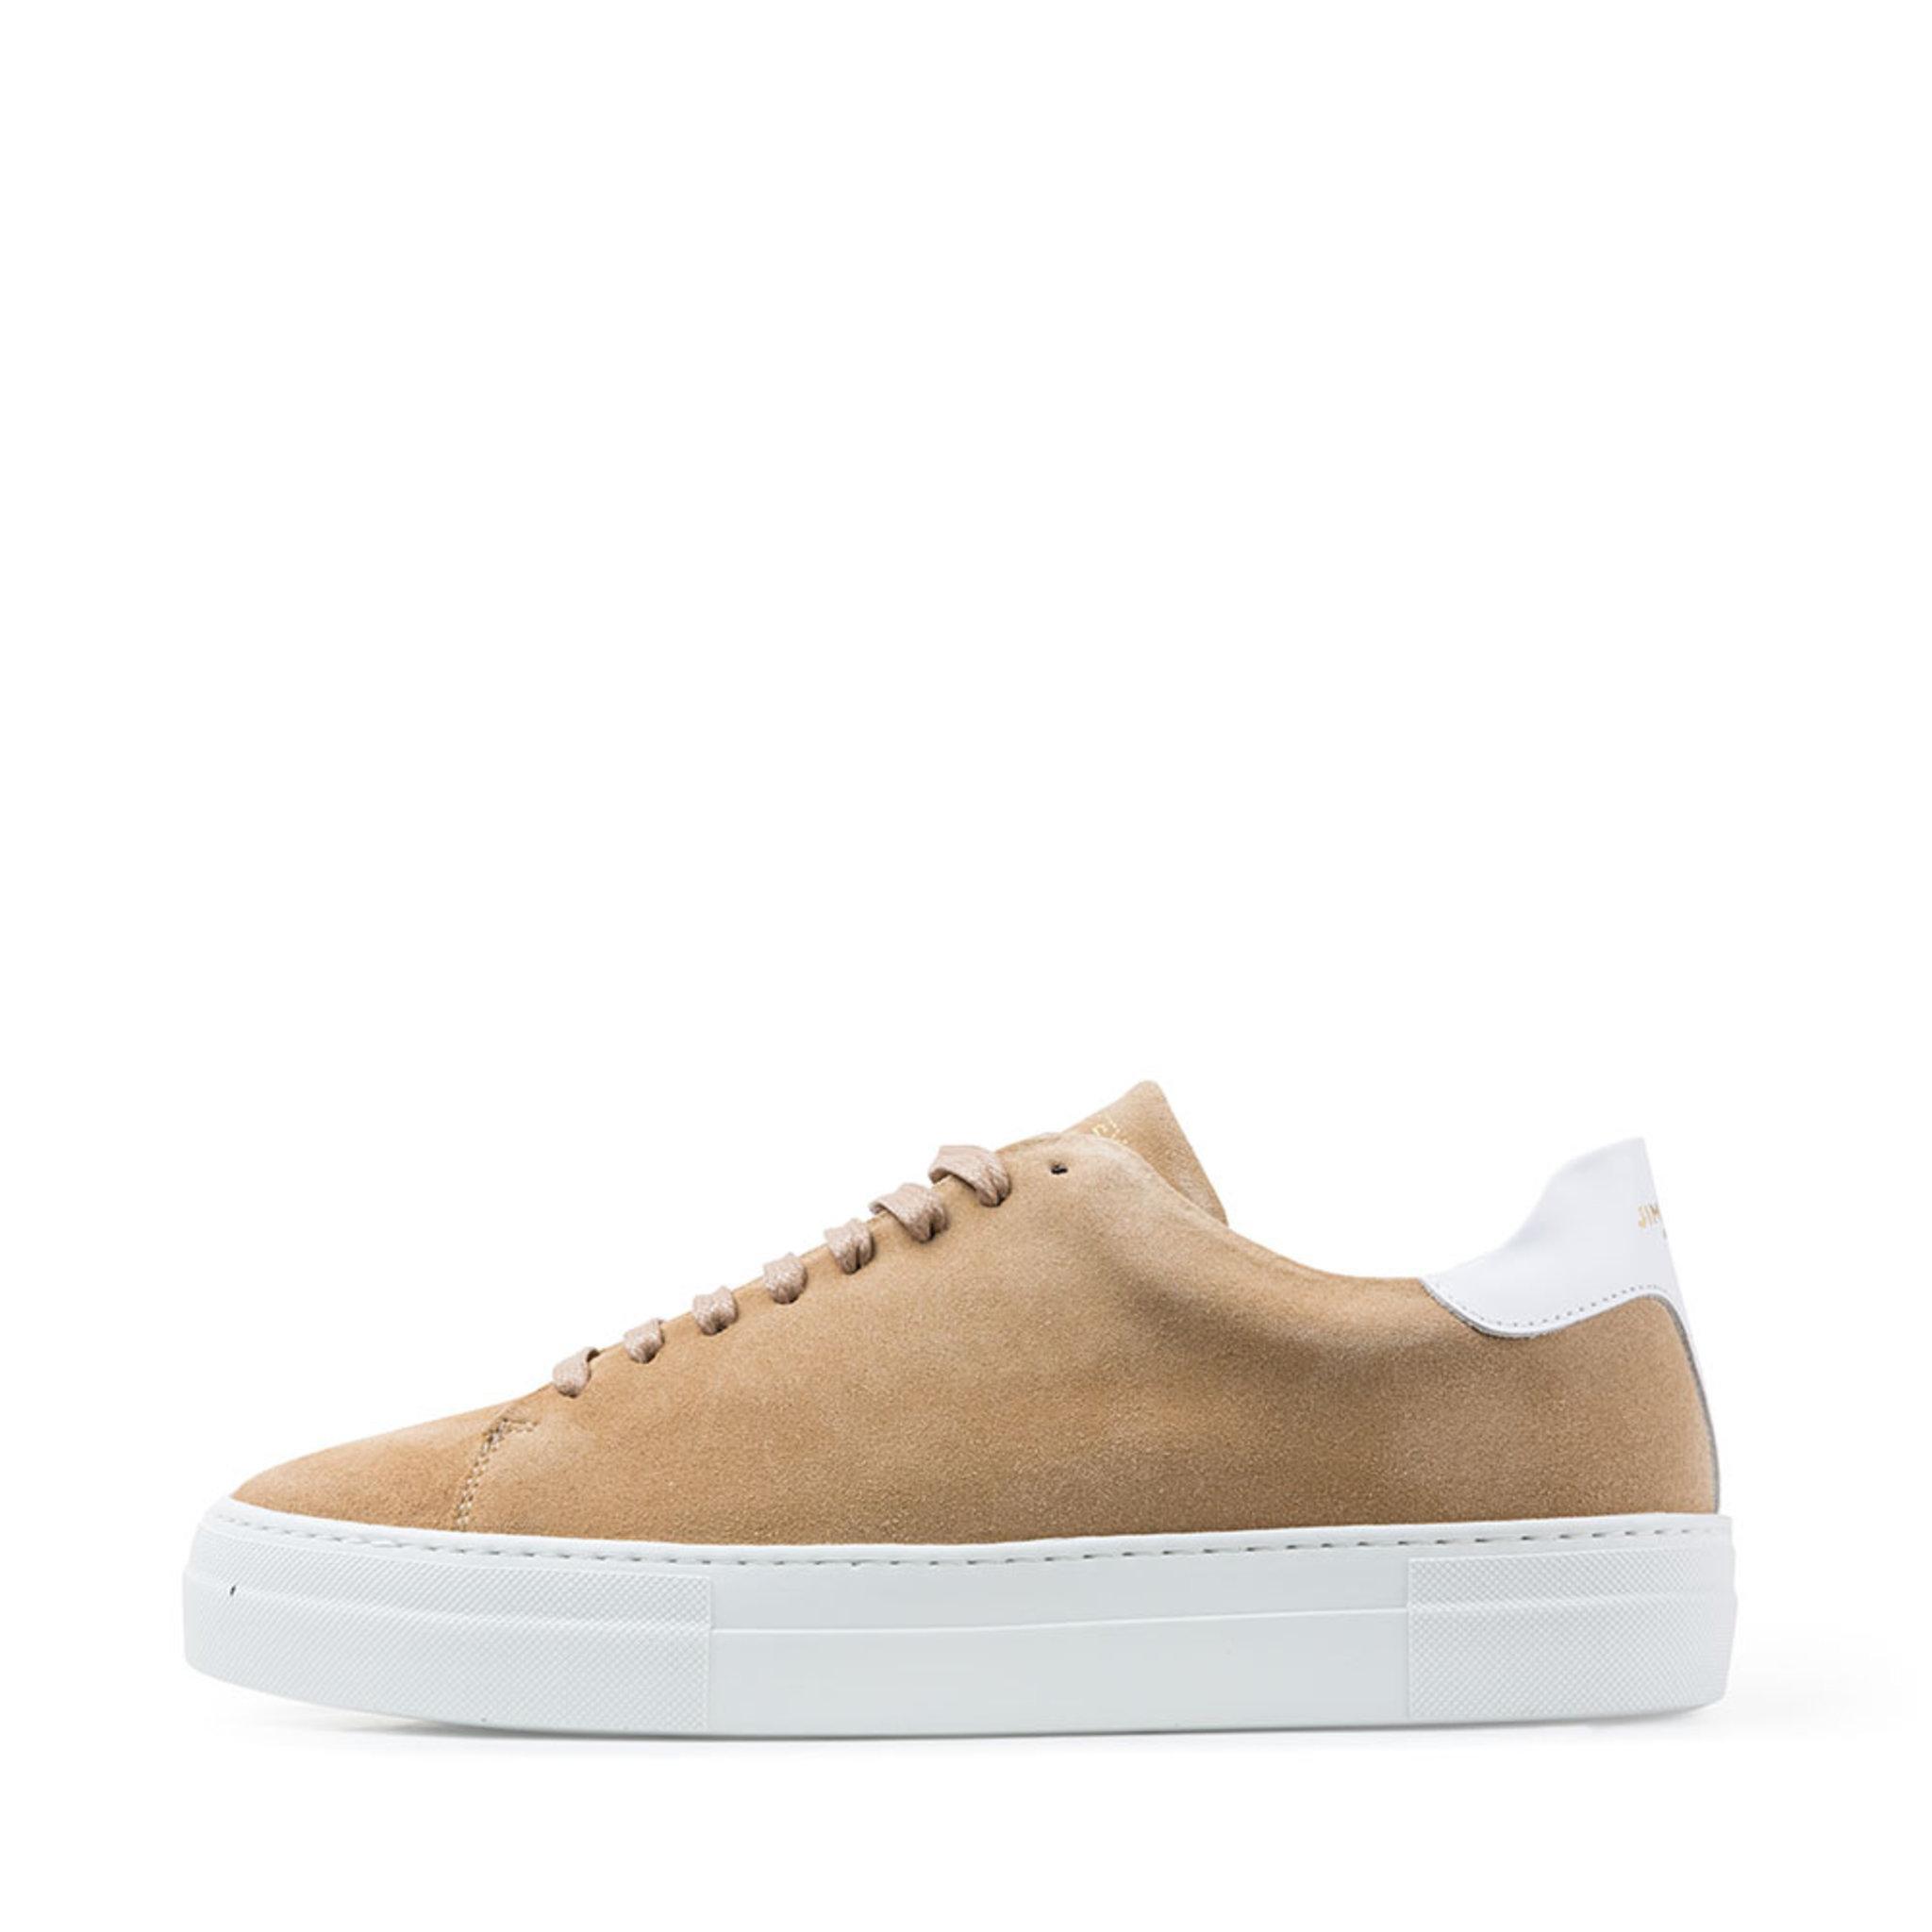 Footwear Pulp